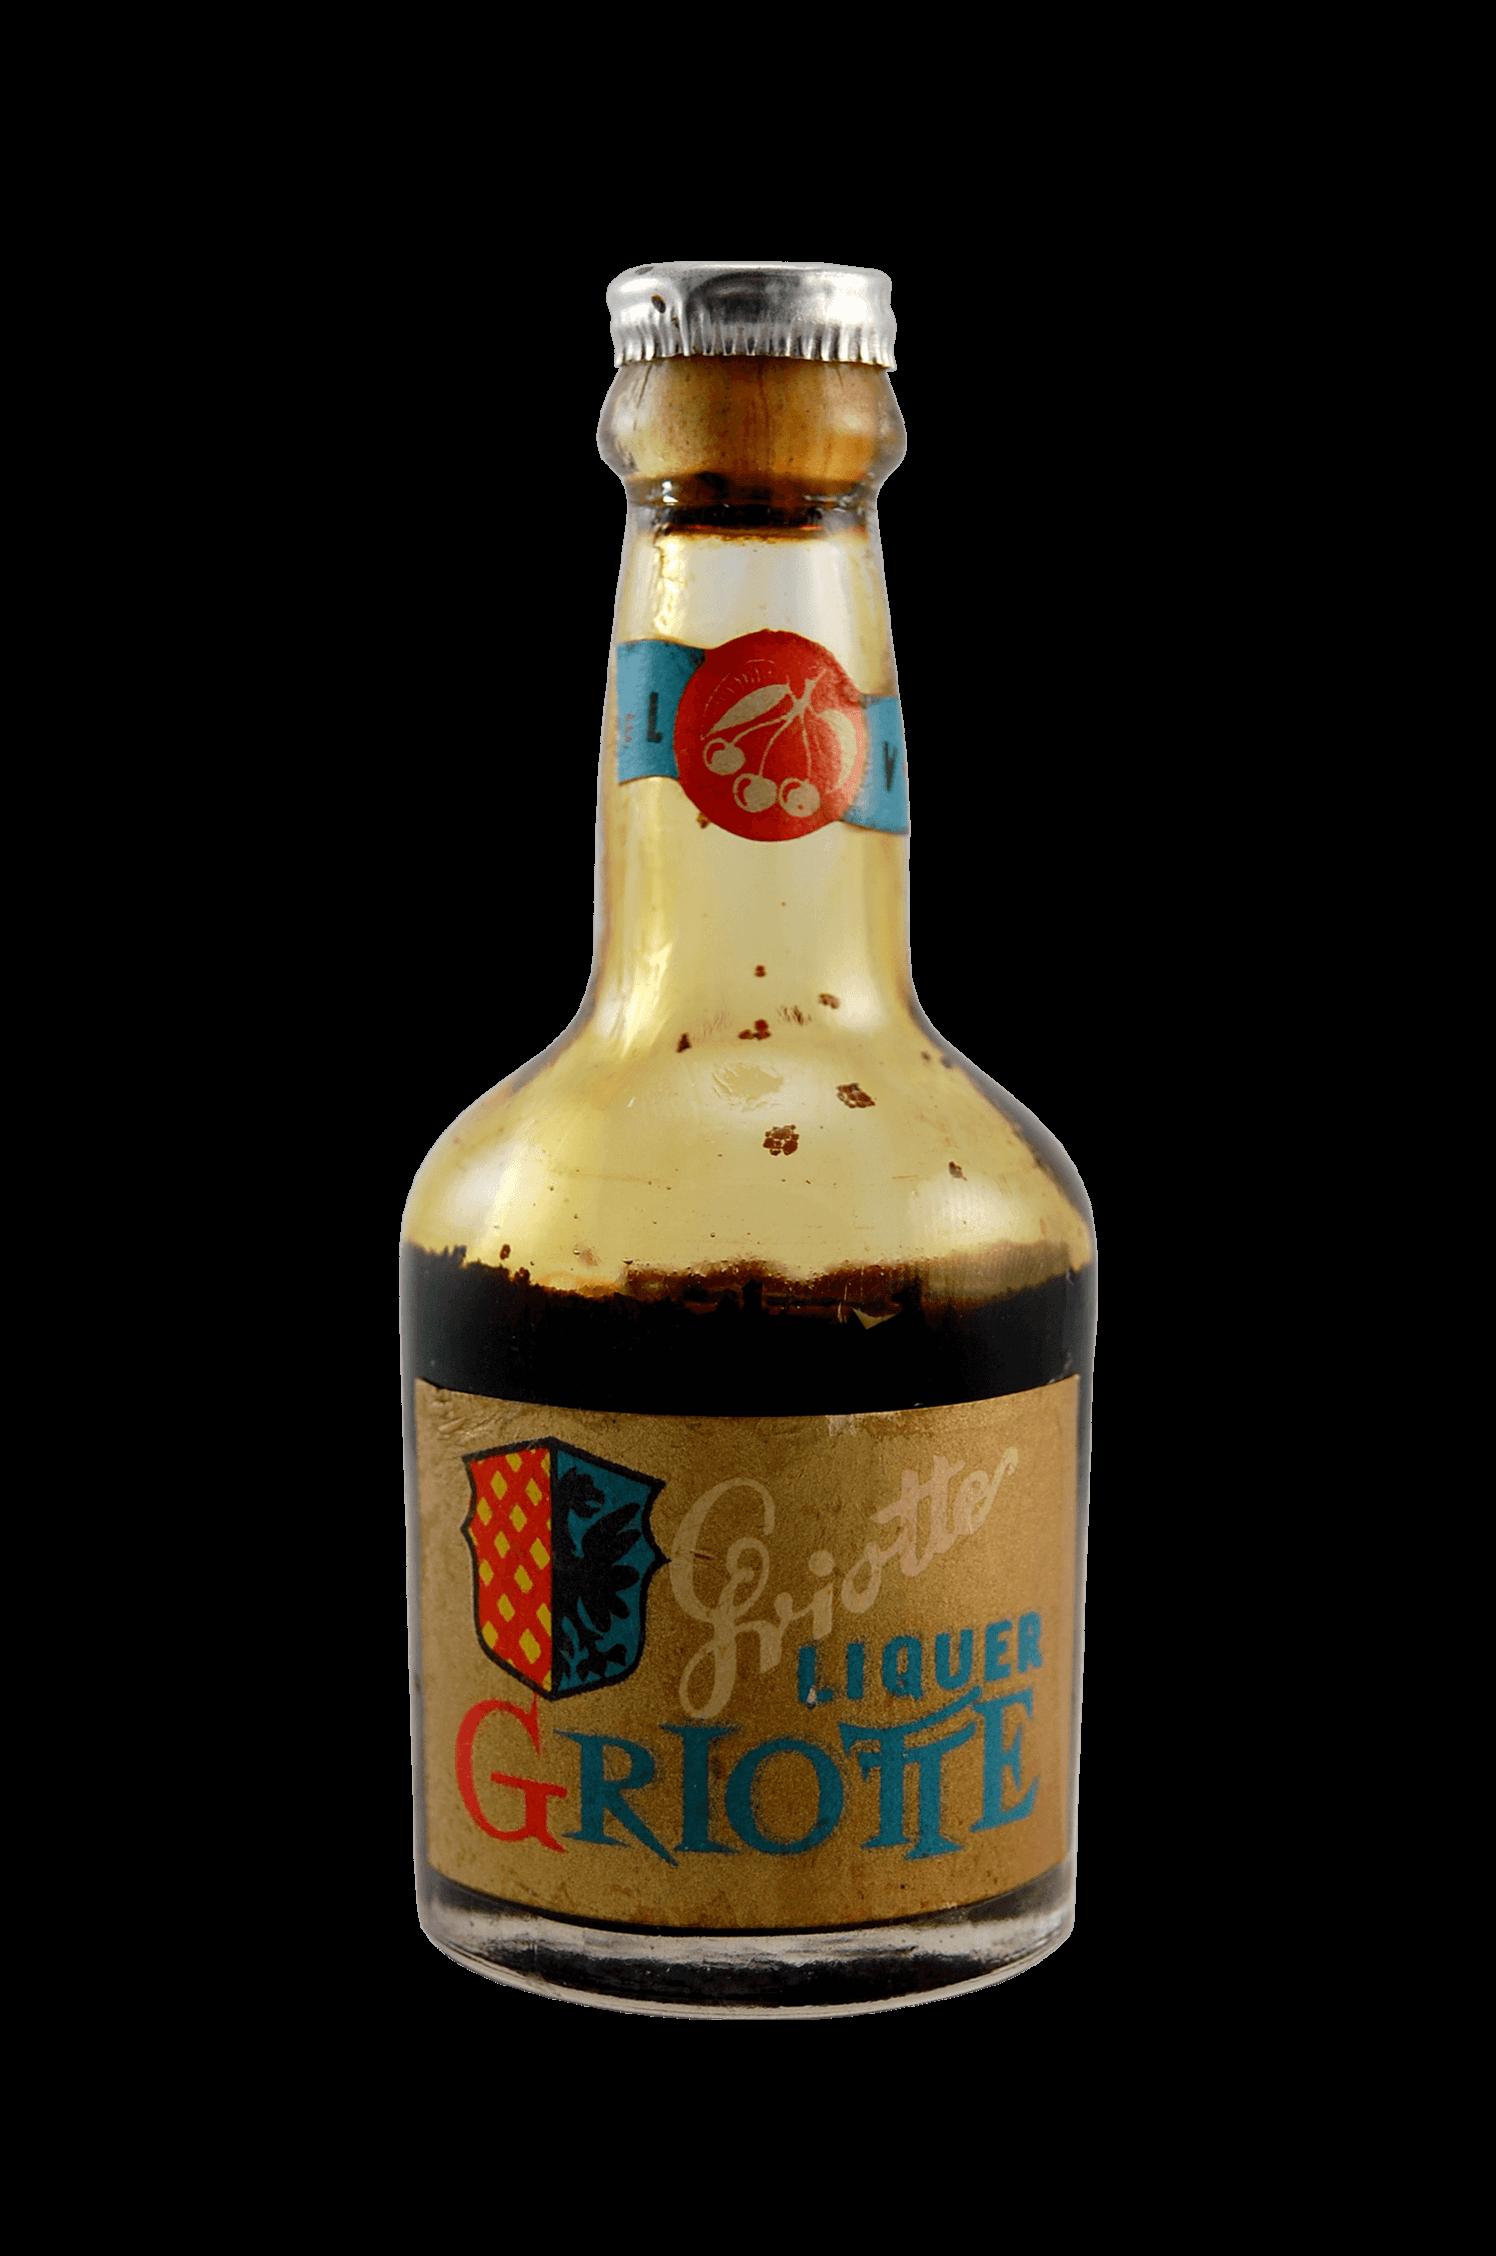 Griotte Liquer